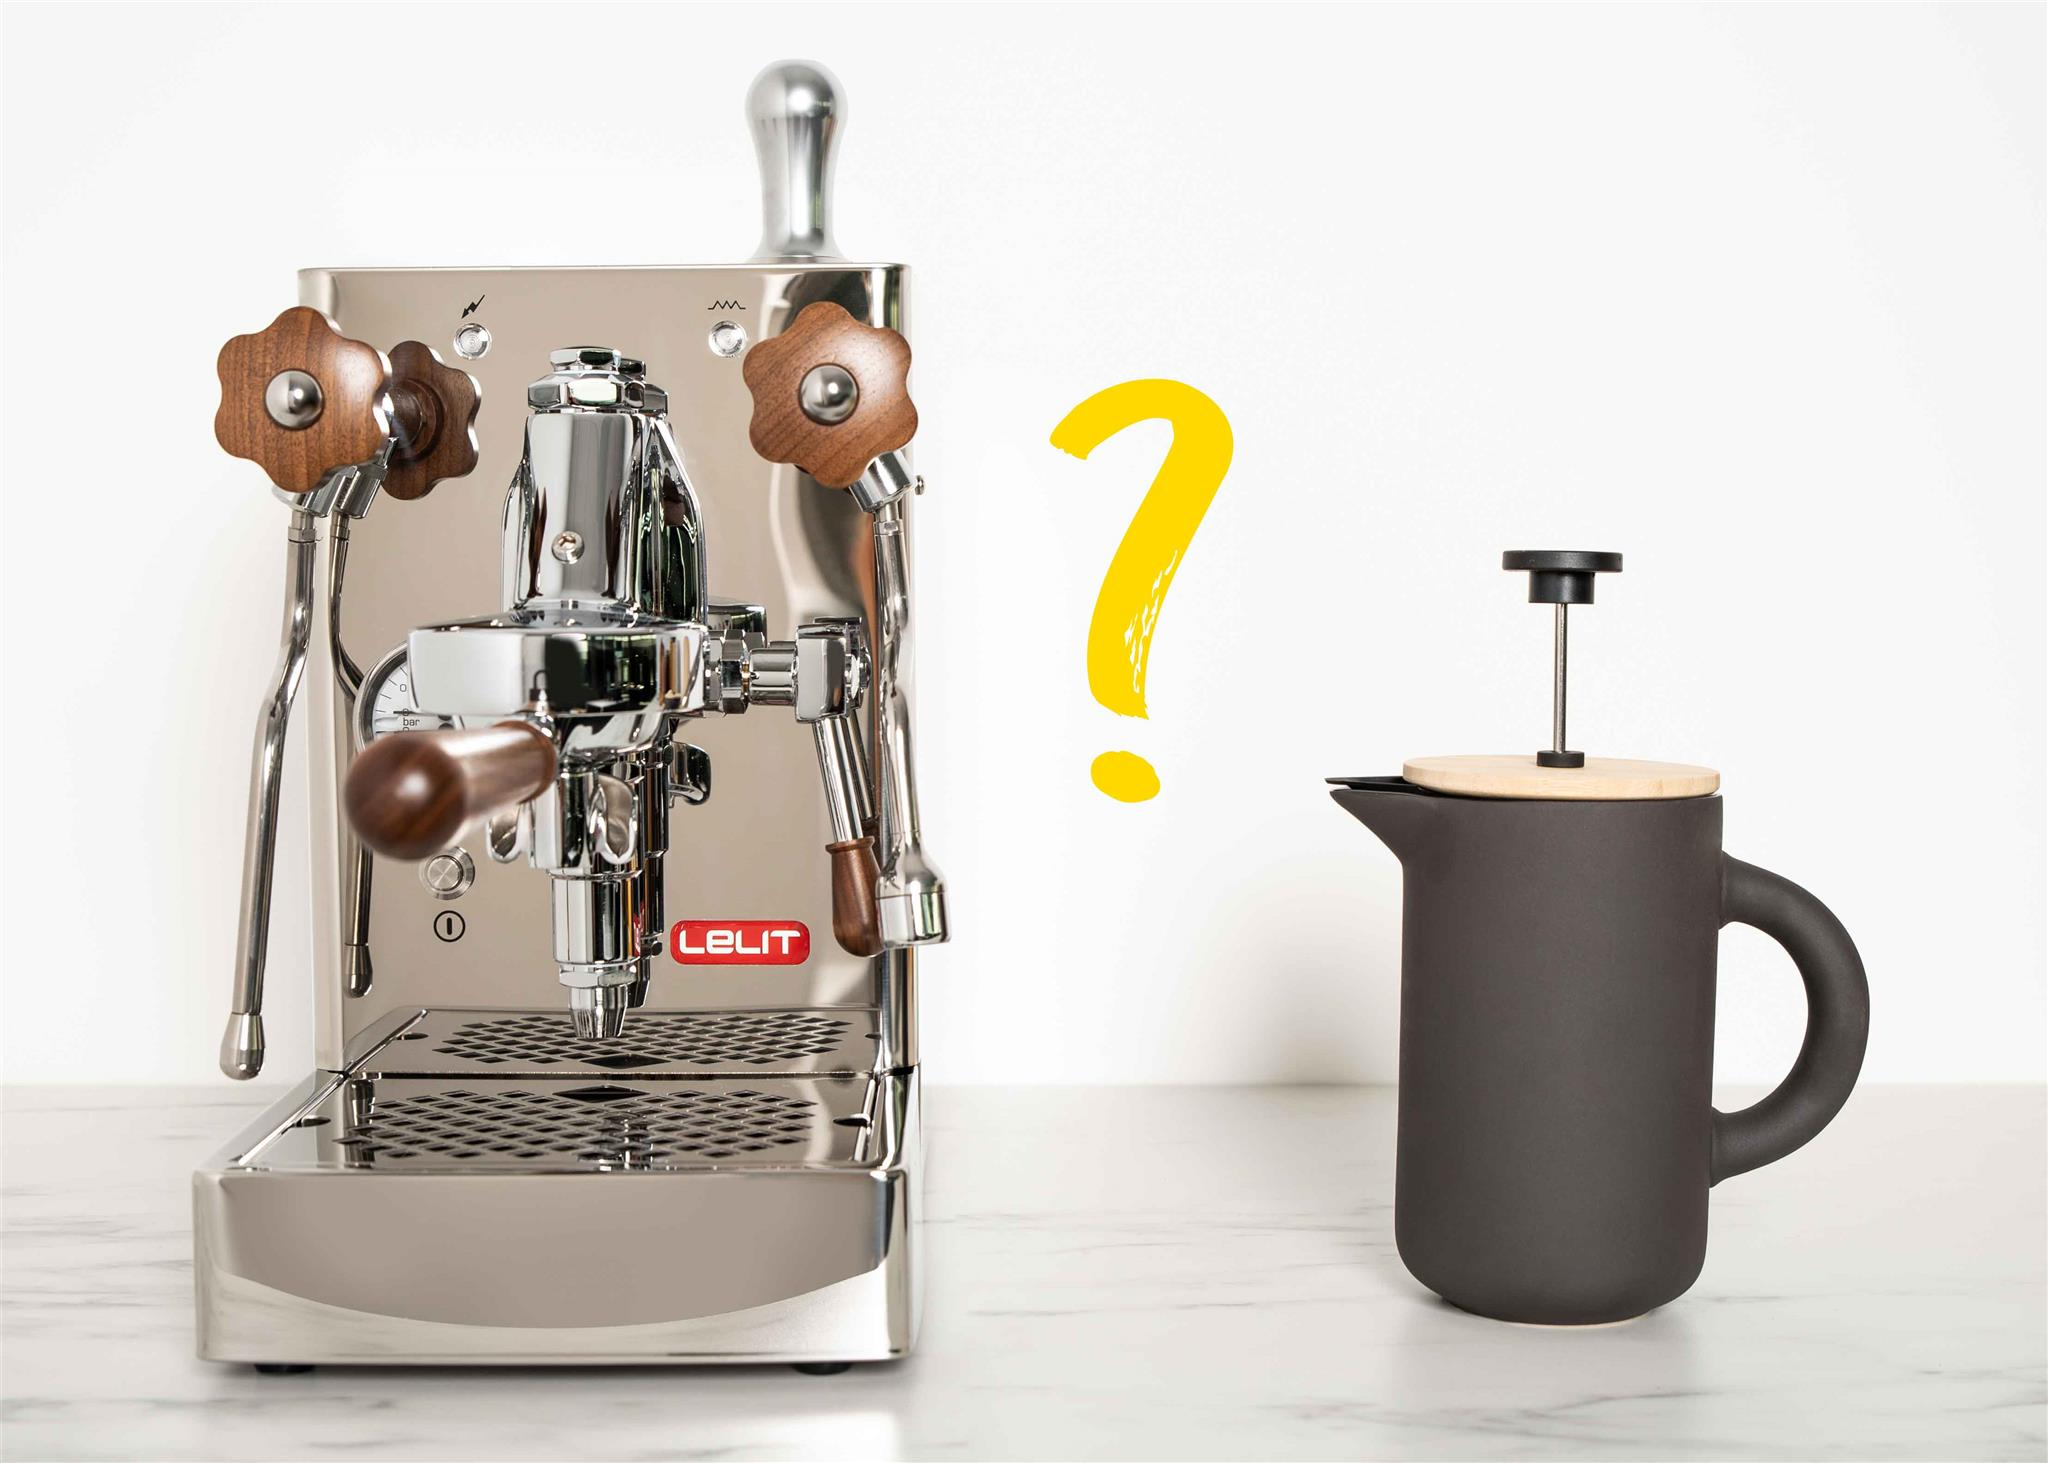 Coffee grinder according to preparation method